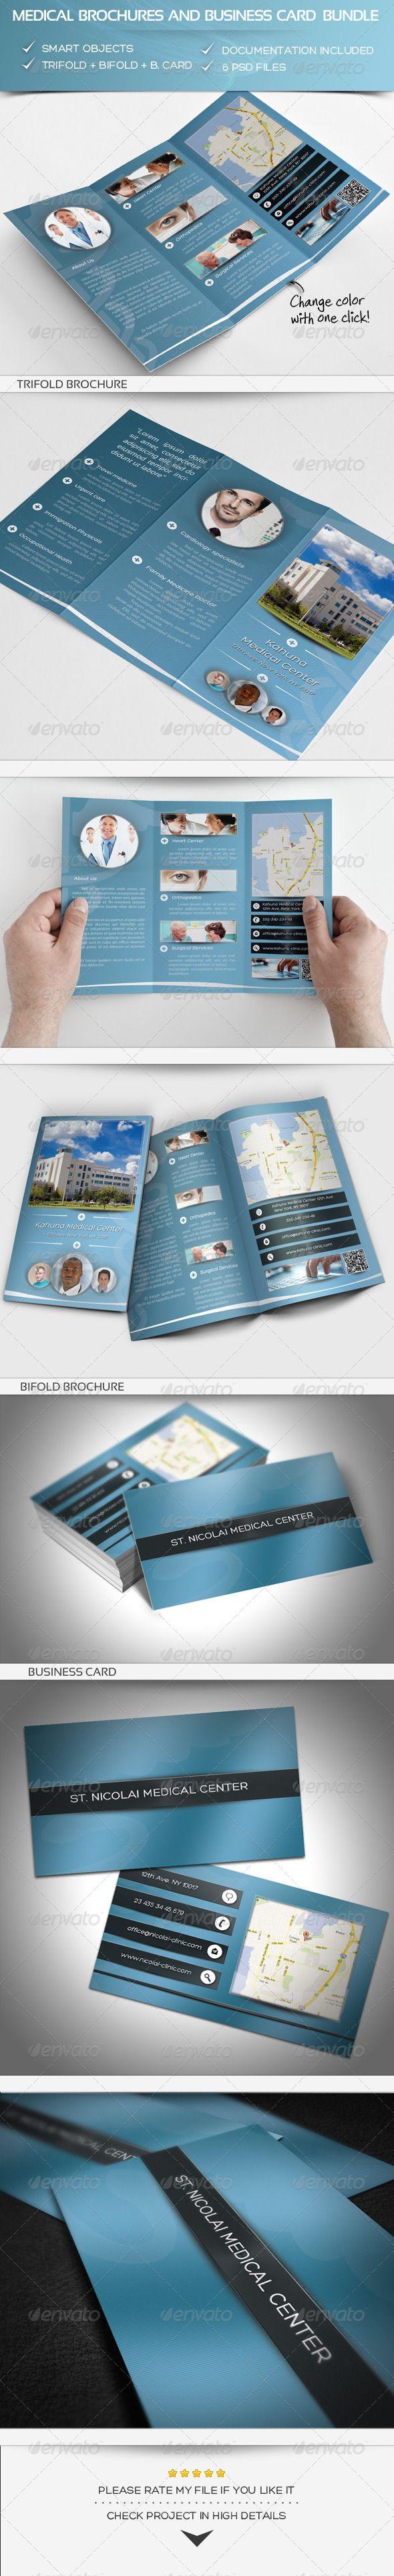 best 25 medical brochure ideas on pinterest